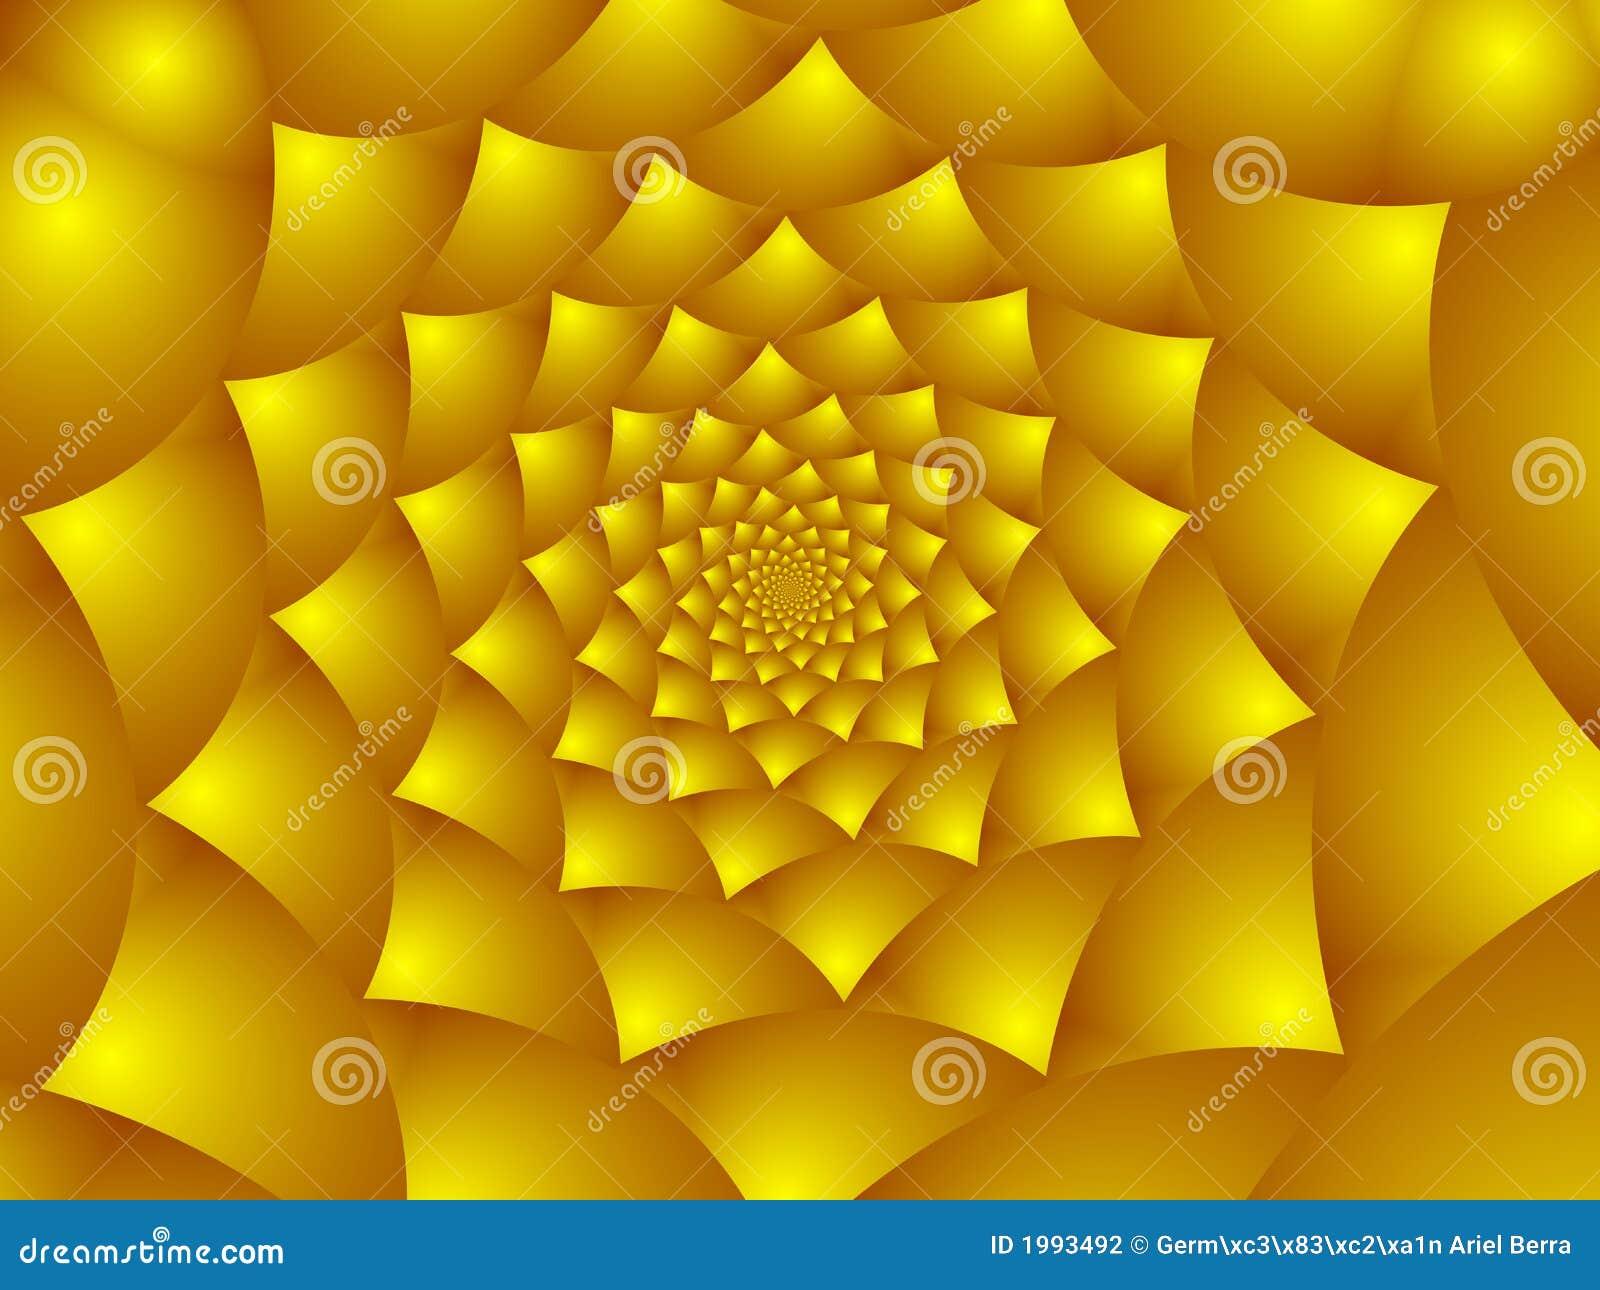 Pétalas douradas da flor.